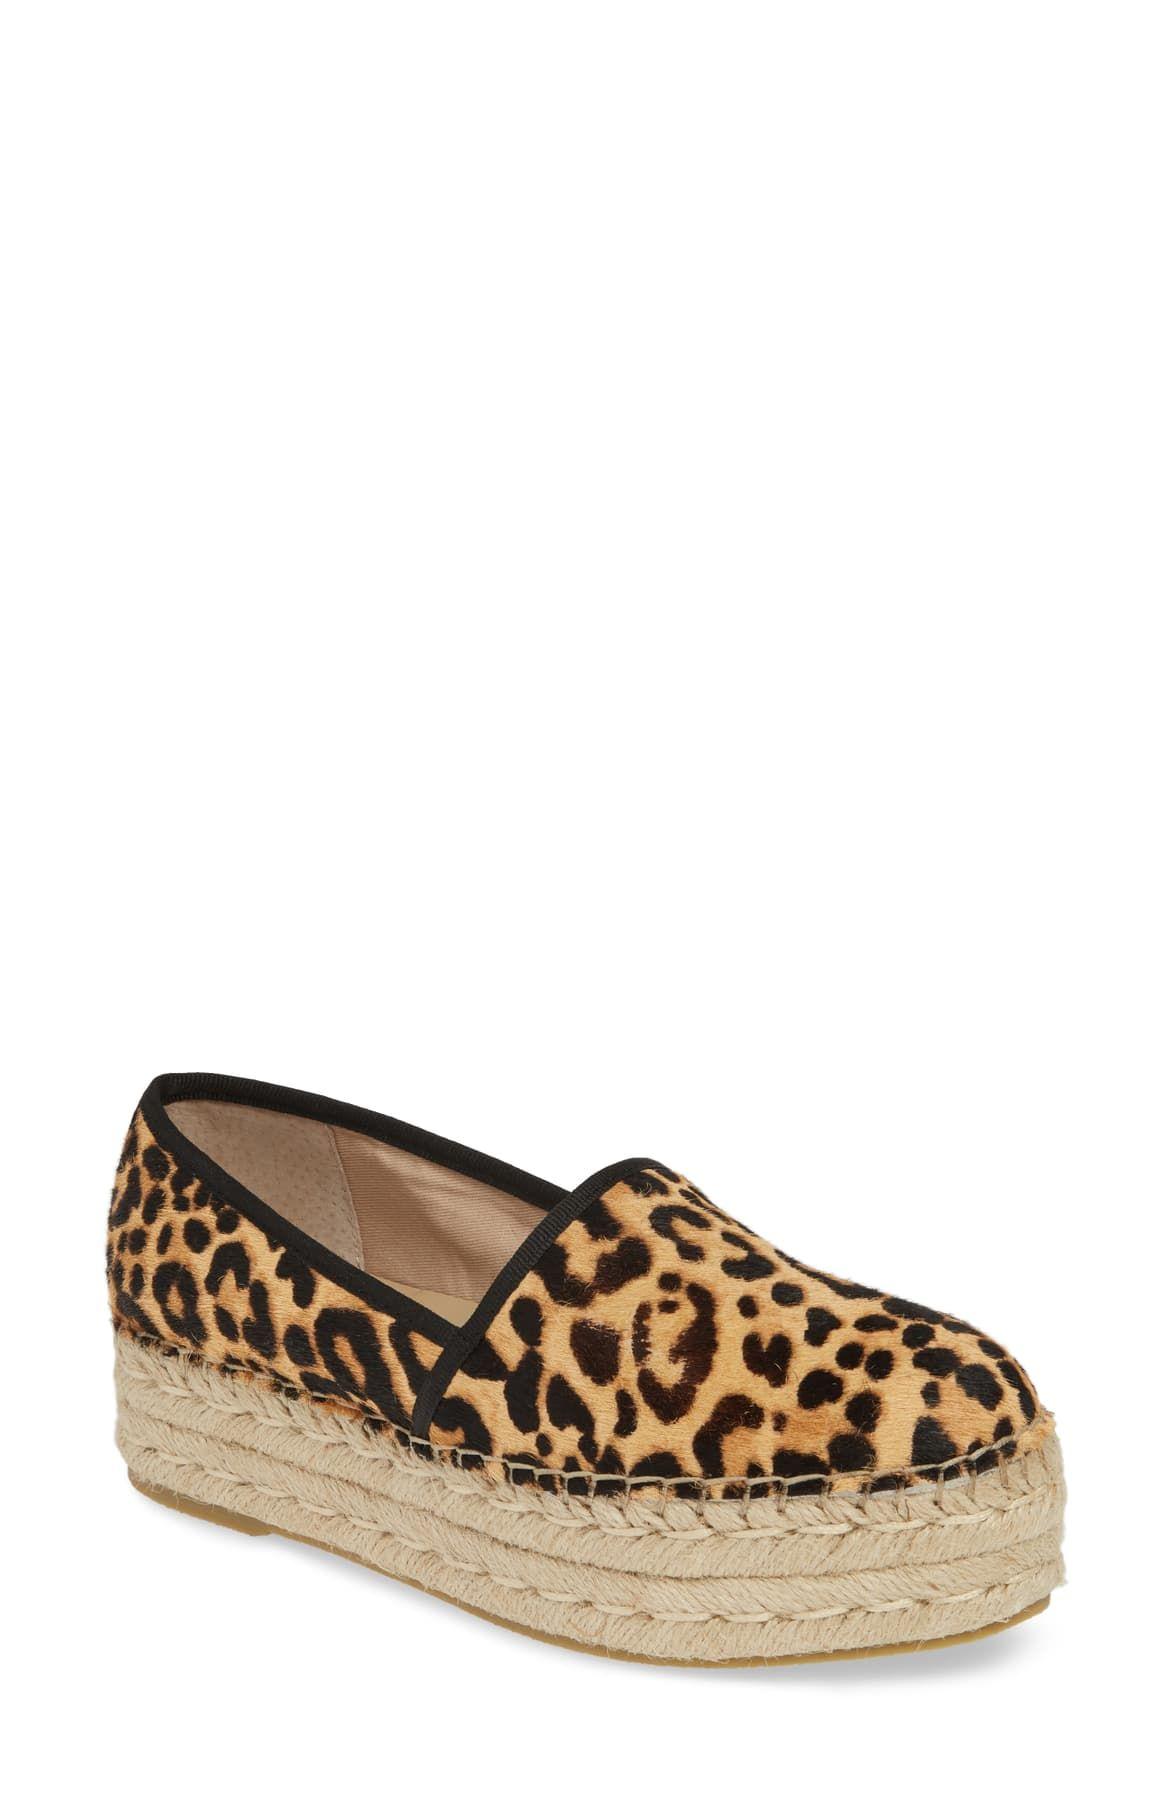 Steve Madden Alexia leopard Espadrille